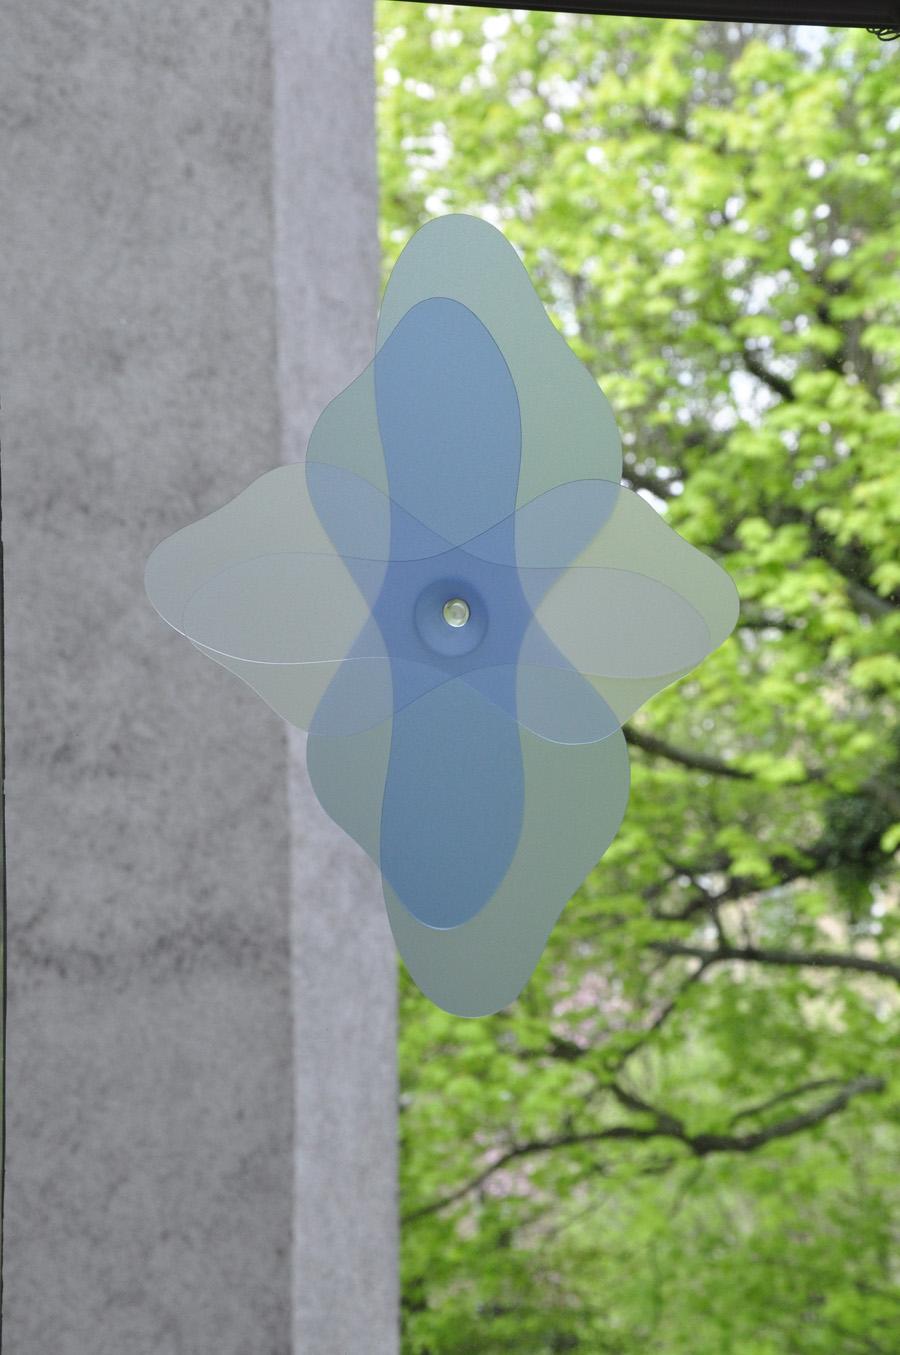 Freydenberg_Trans_Flower_Butterfly_19.jpg